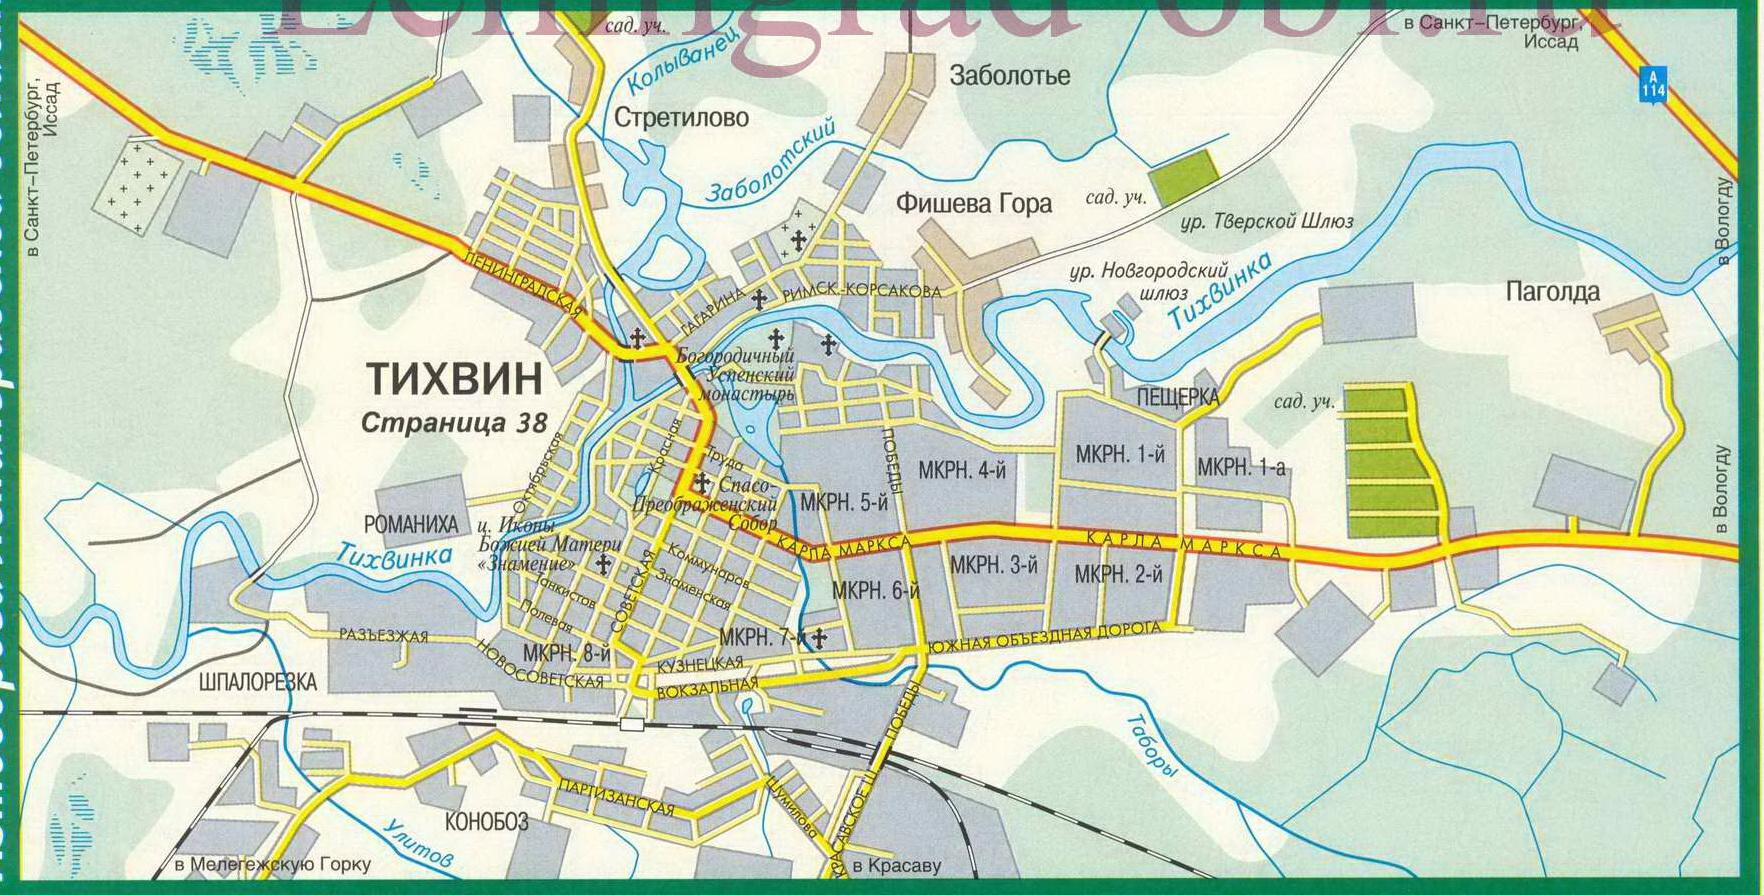 Тихвин. Карта Тихвина. Карта улиц города Тихвин ...: http://rf-town.ru/981440.html